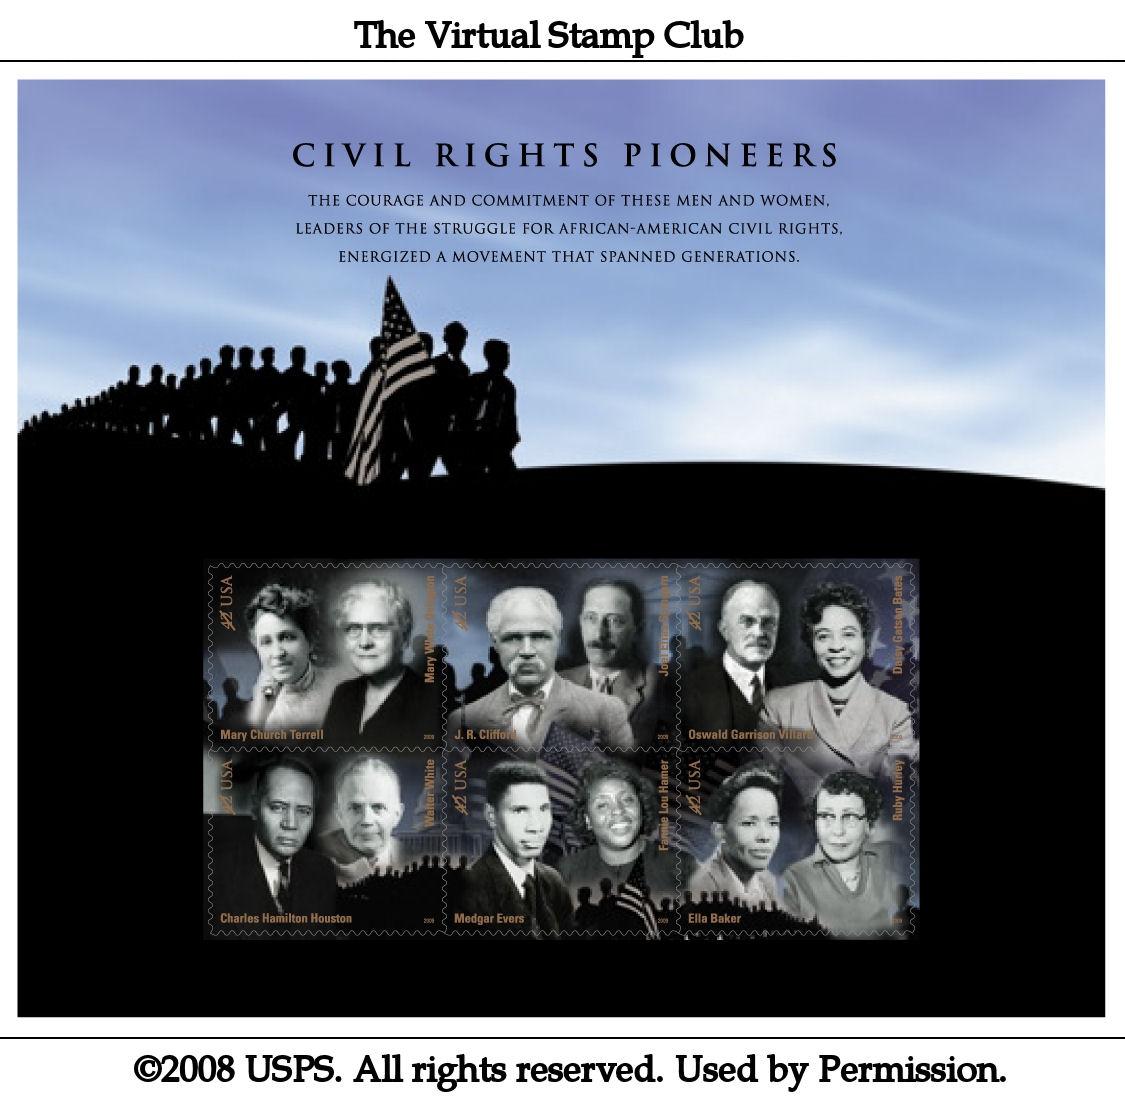 Civil Rights Pioneers (2009)